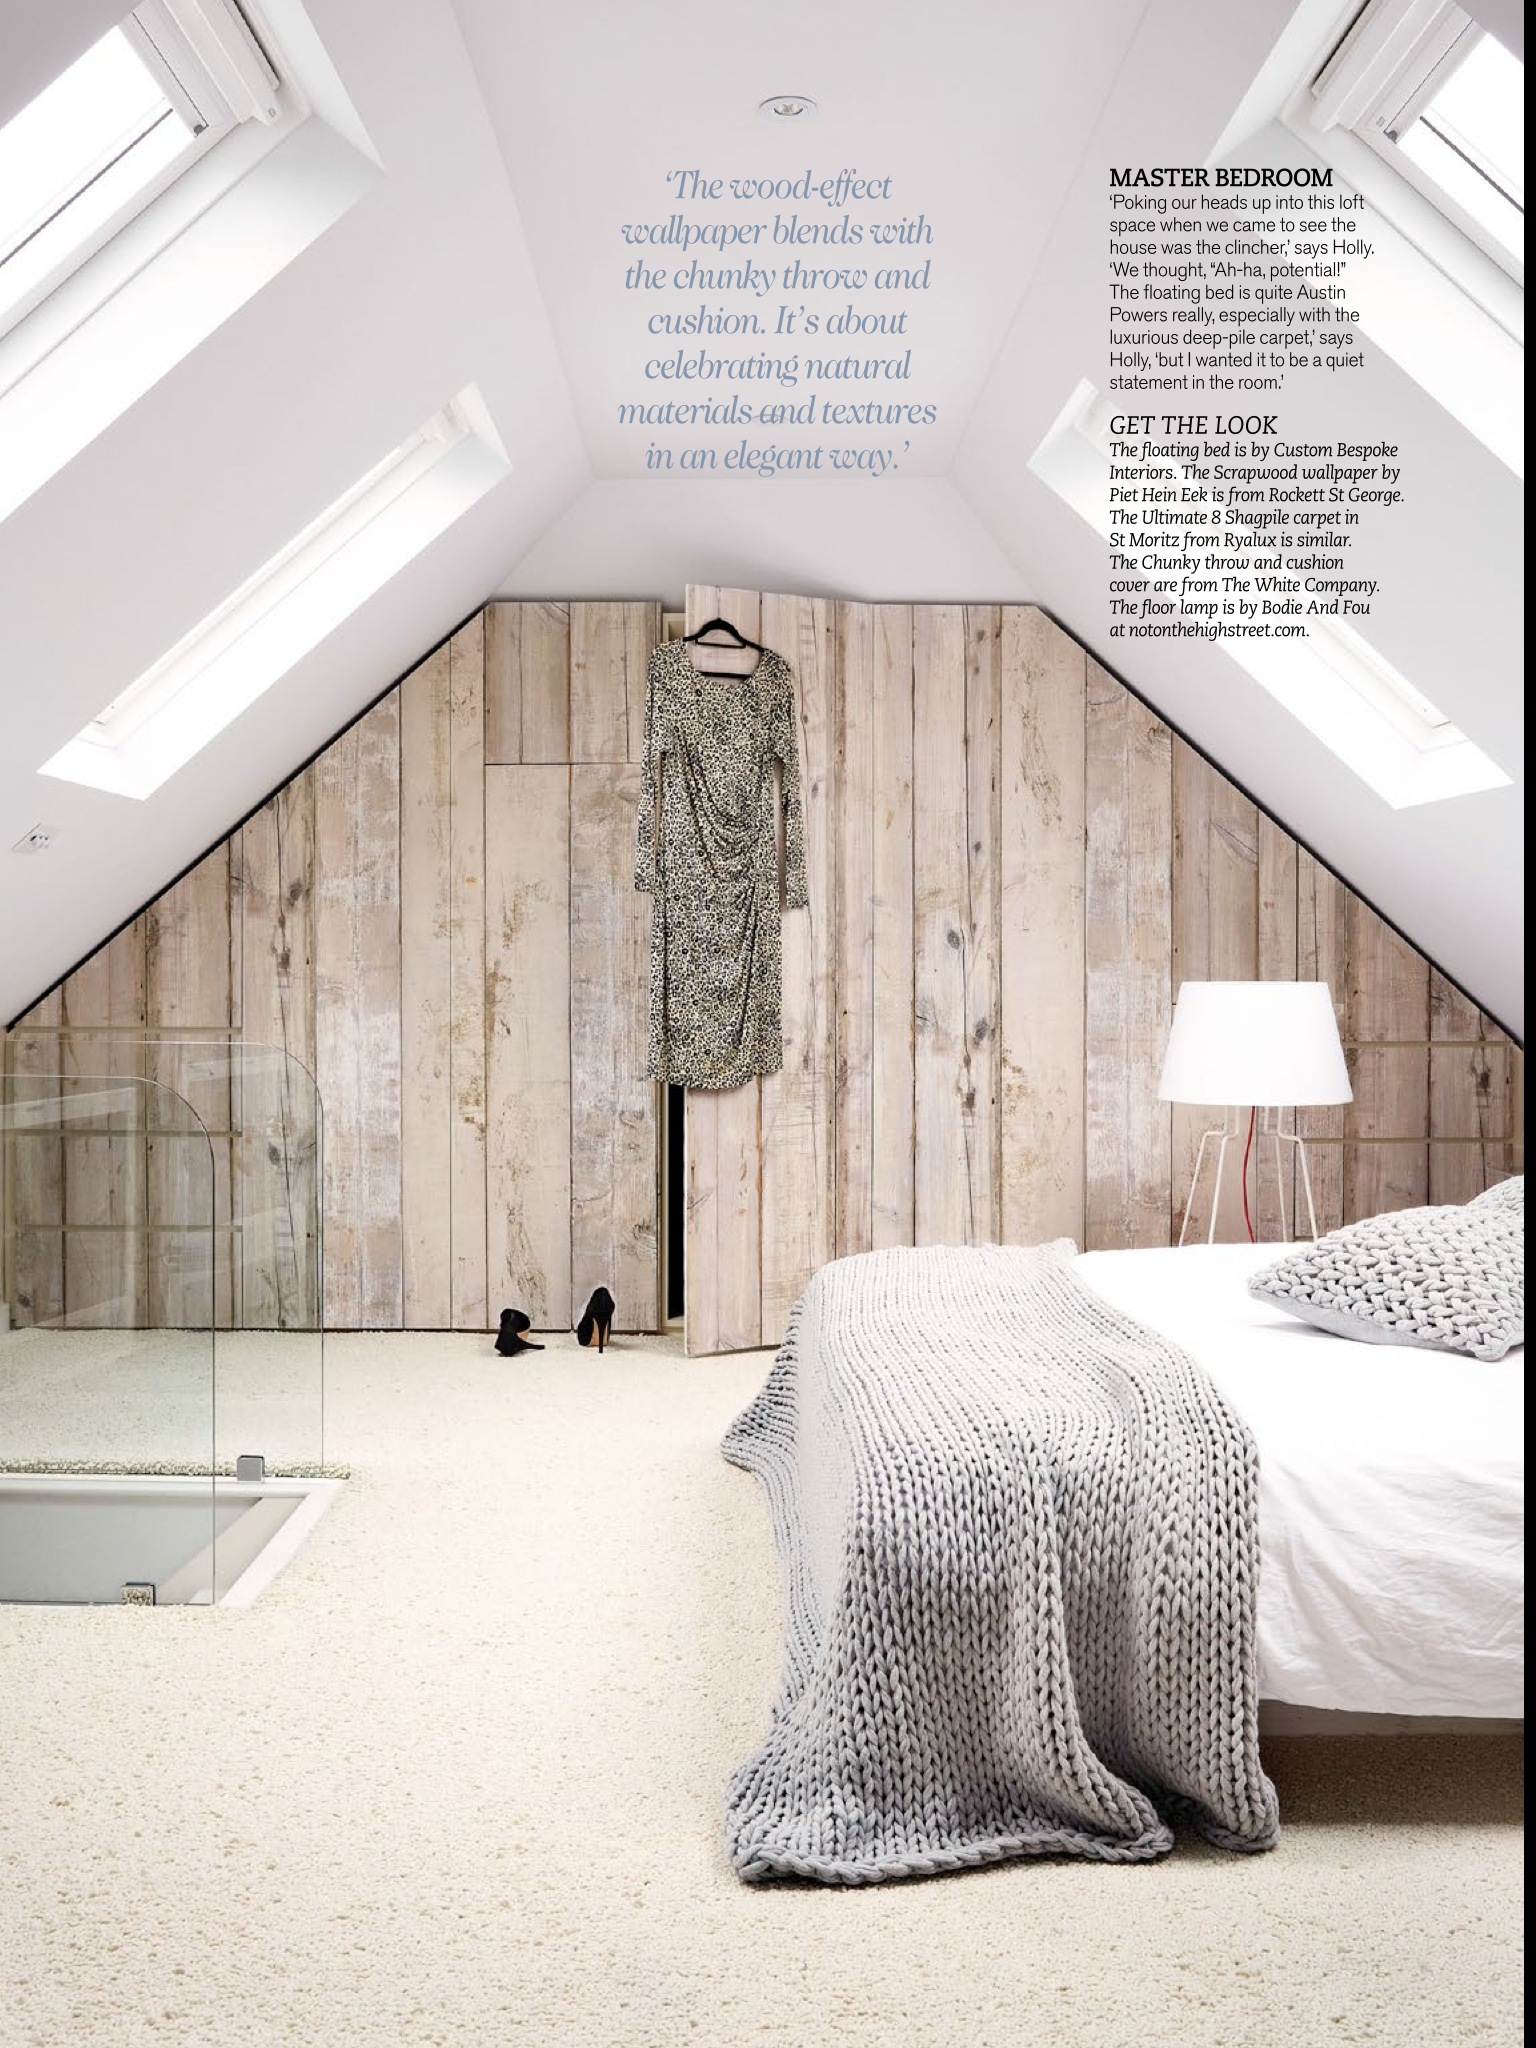 Pin By Craig Hawkins On Ideas For Home In 2020 Loft Spaces Attic Bedroom Designs Bedroom Loft